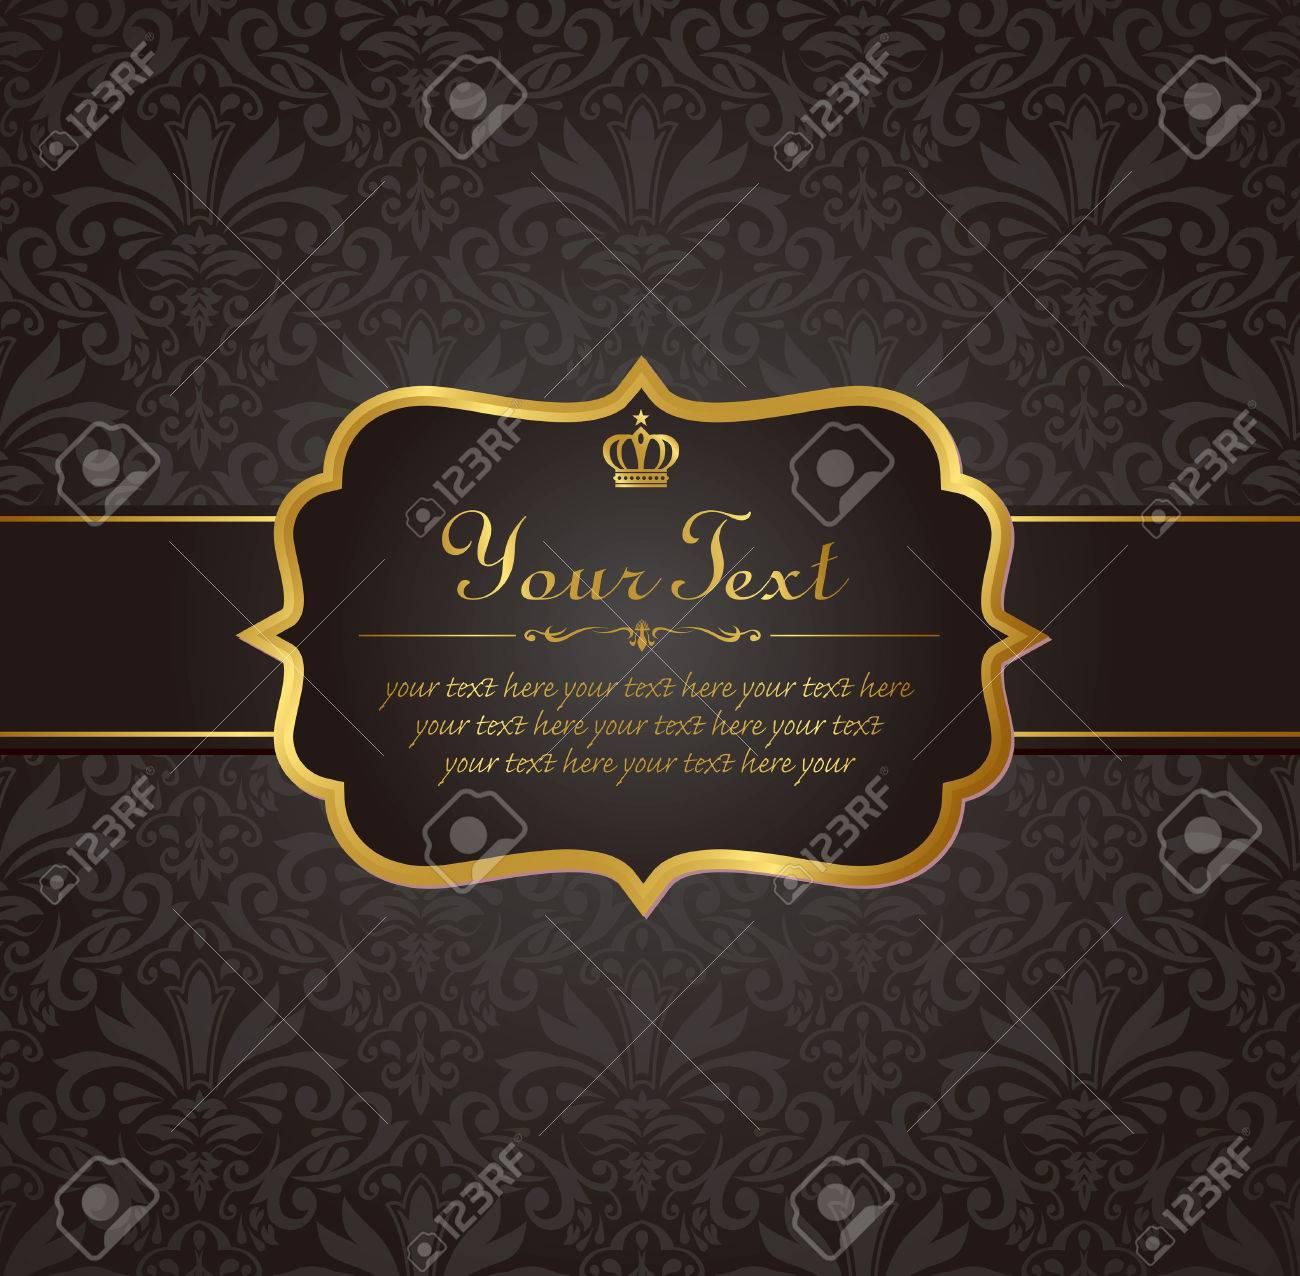 Invitation vintage label vector frame royalty free cliparts vectors invitation vintage label vector frame stock vector 29138678 stopboris Choice Image